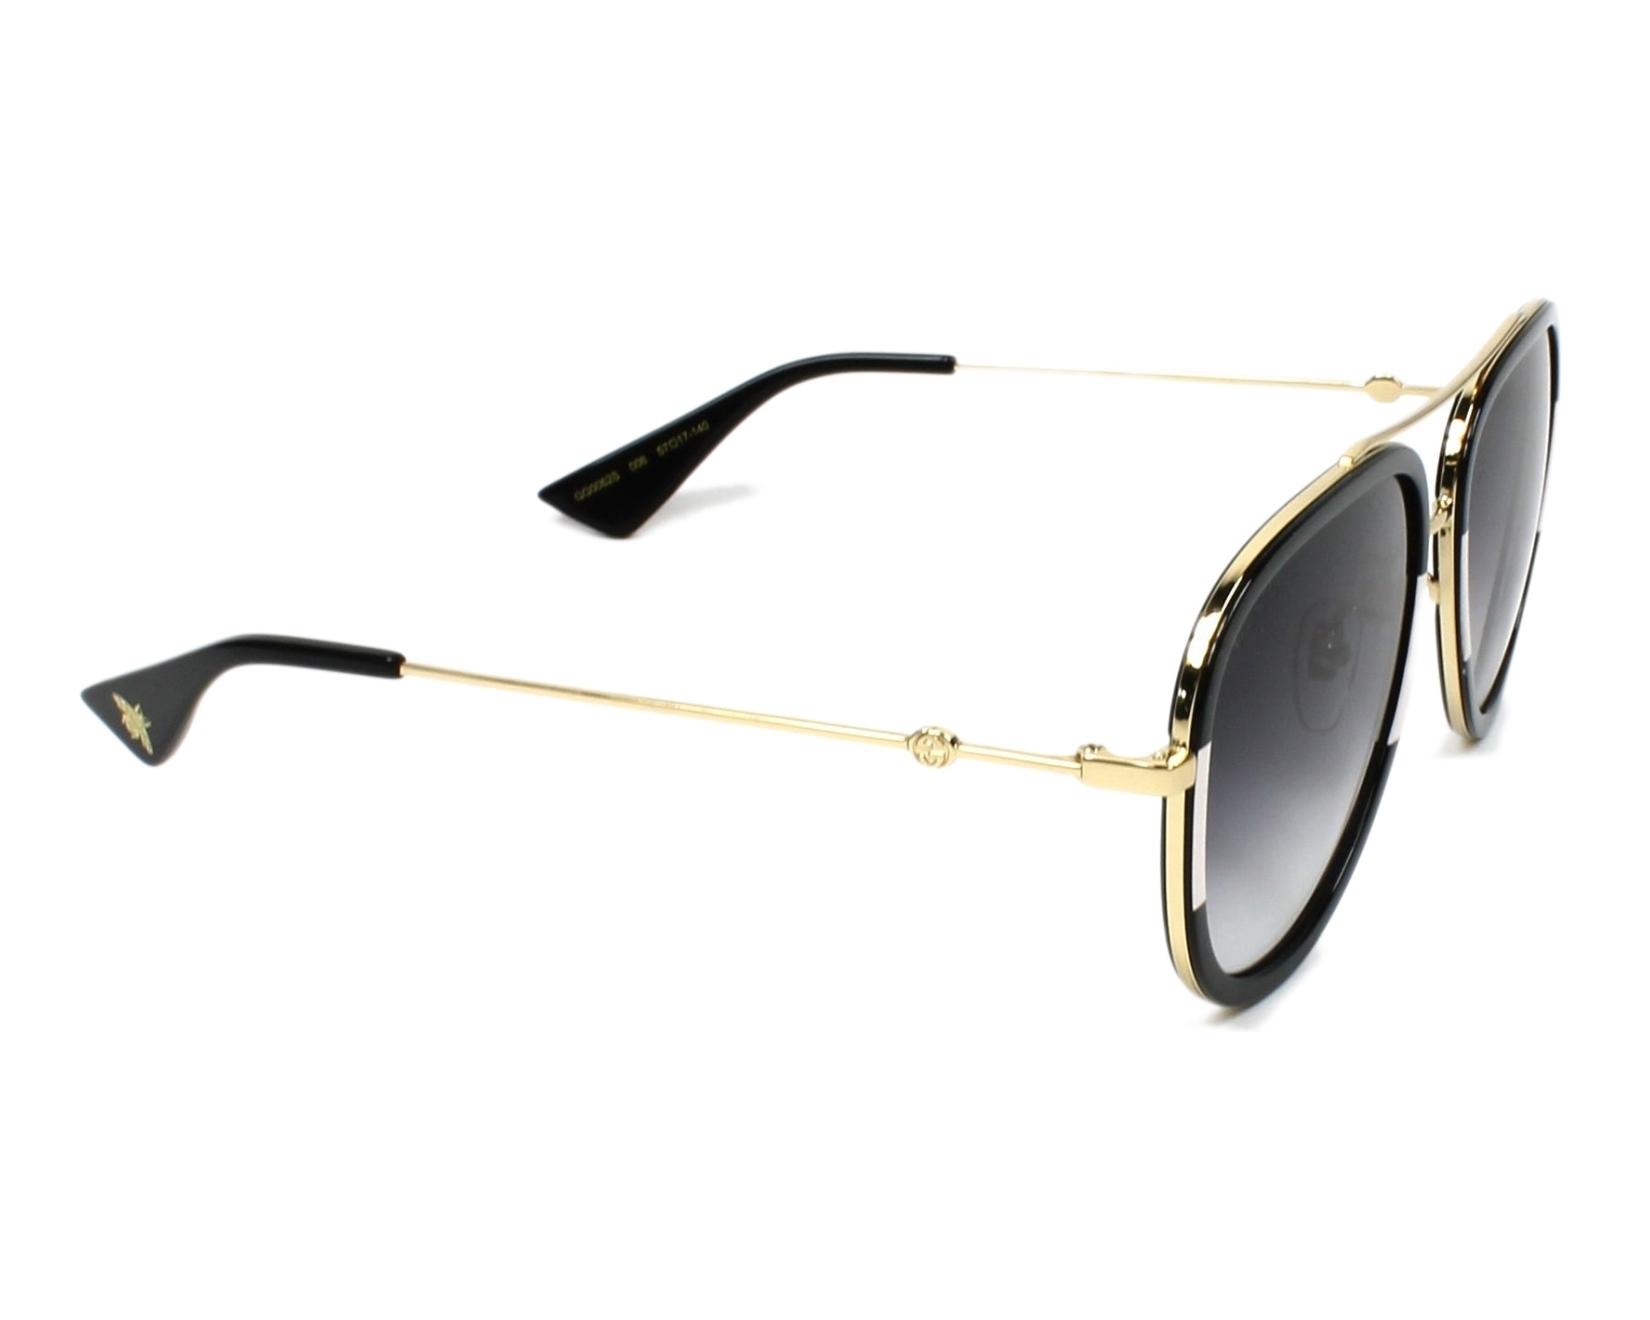 6b028ffc4aa Gafas de sol Gucci GG-0062-S 006 - Negra Blanco vista lateral